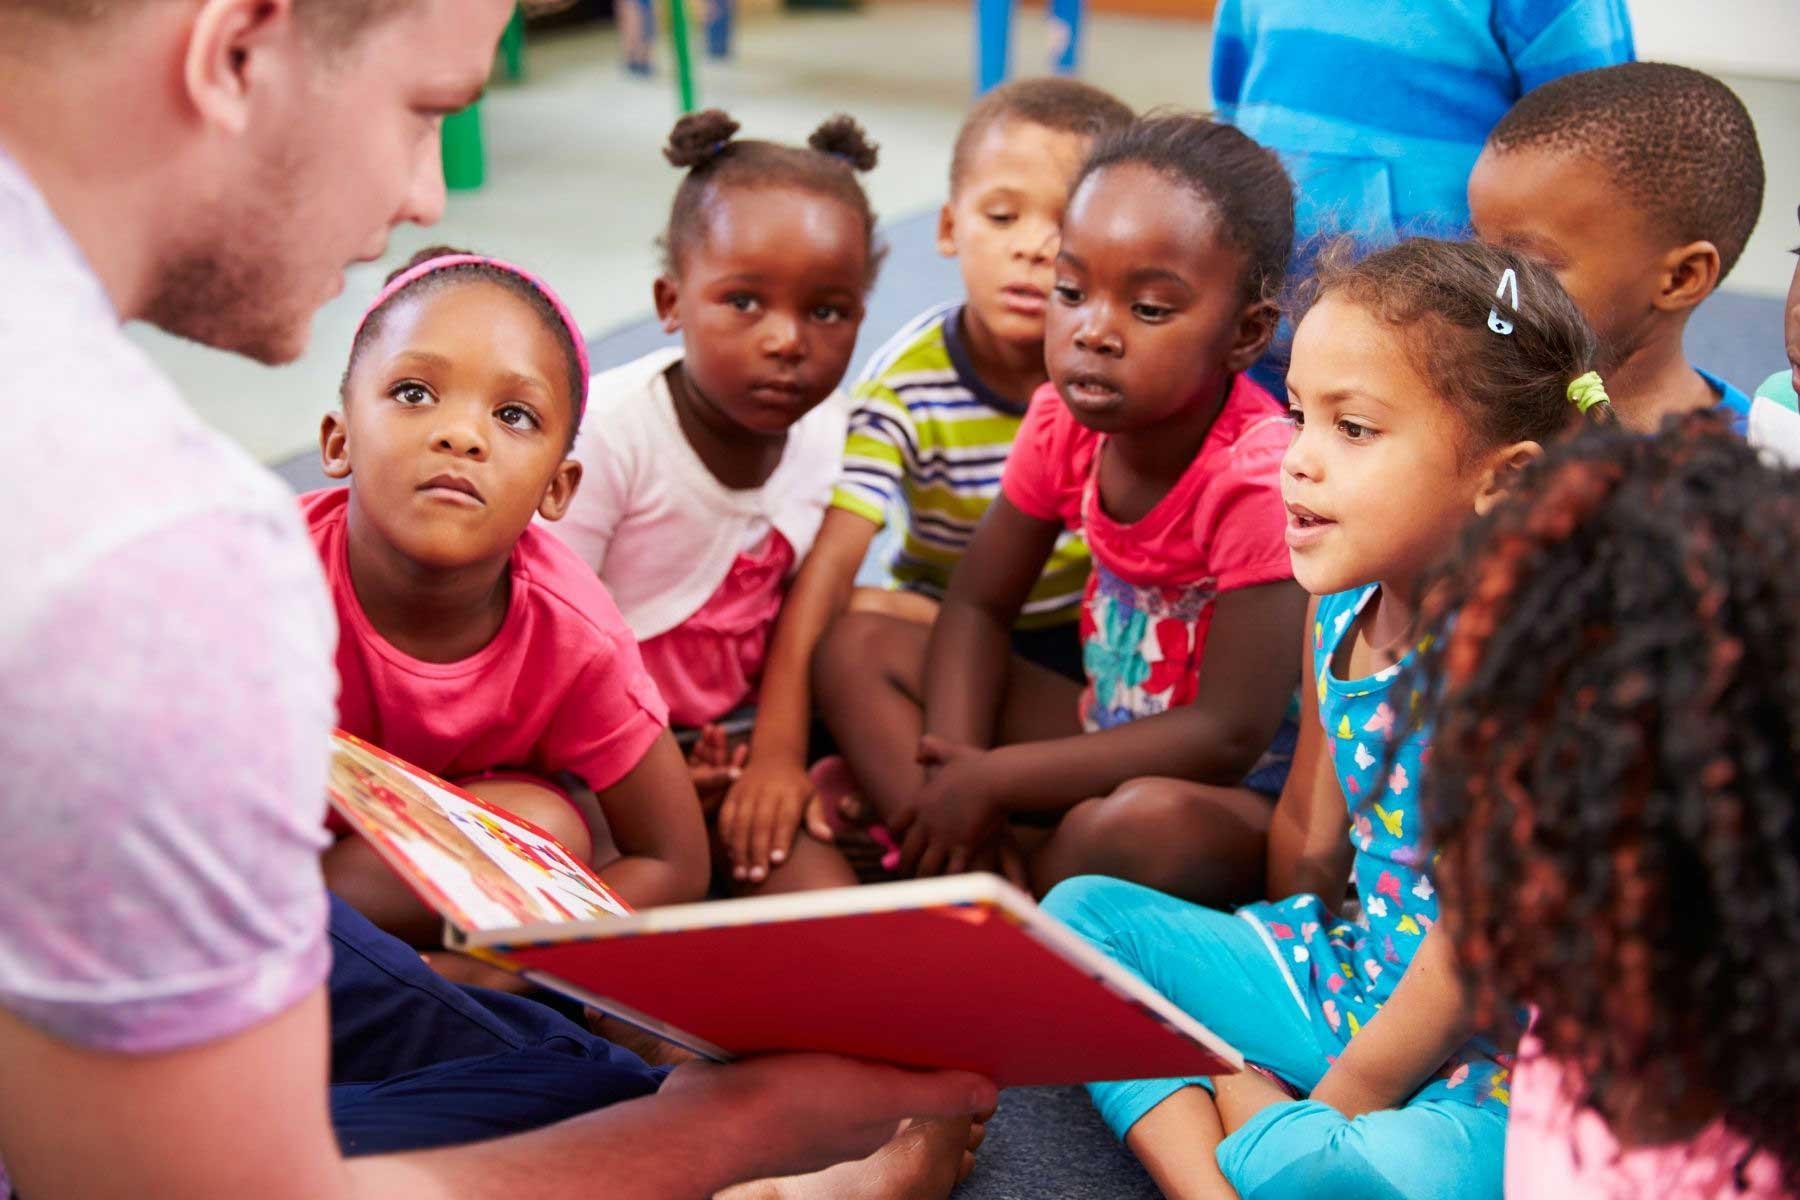 Teachers with daycare children